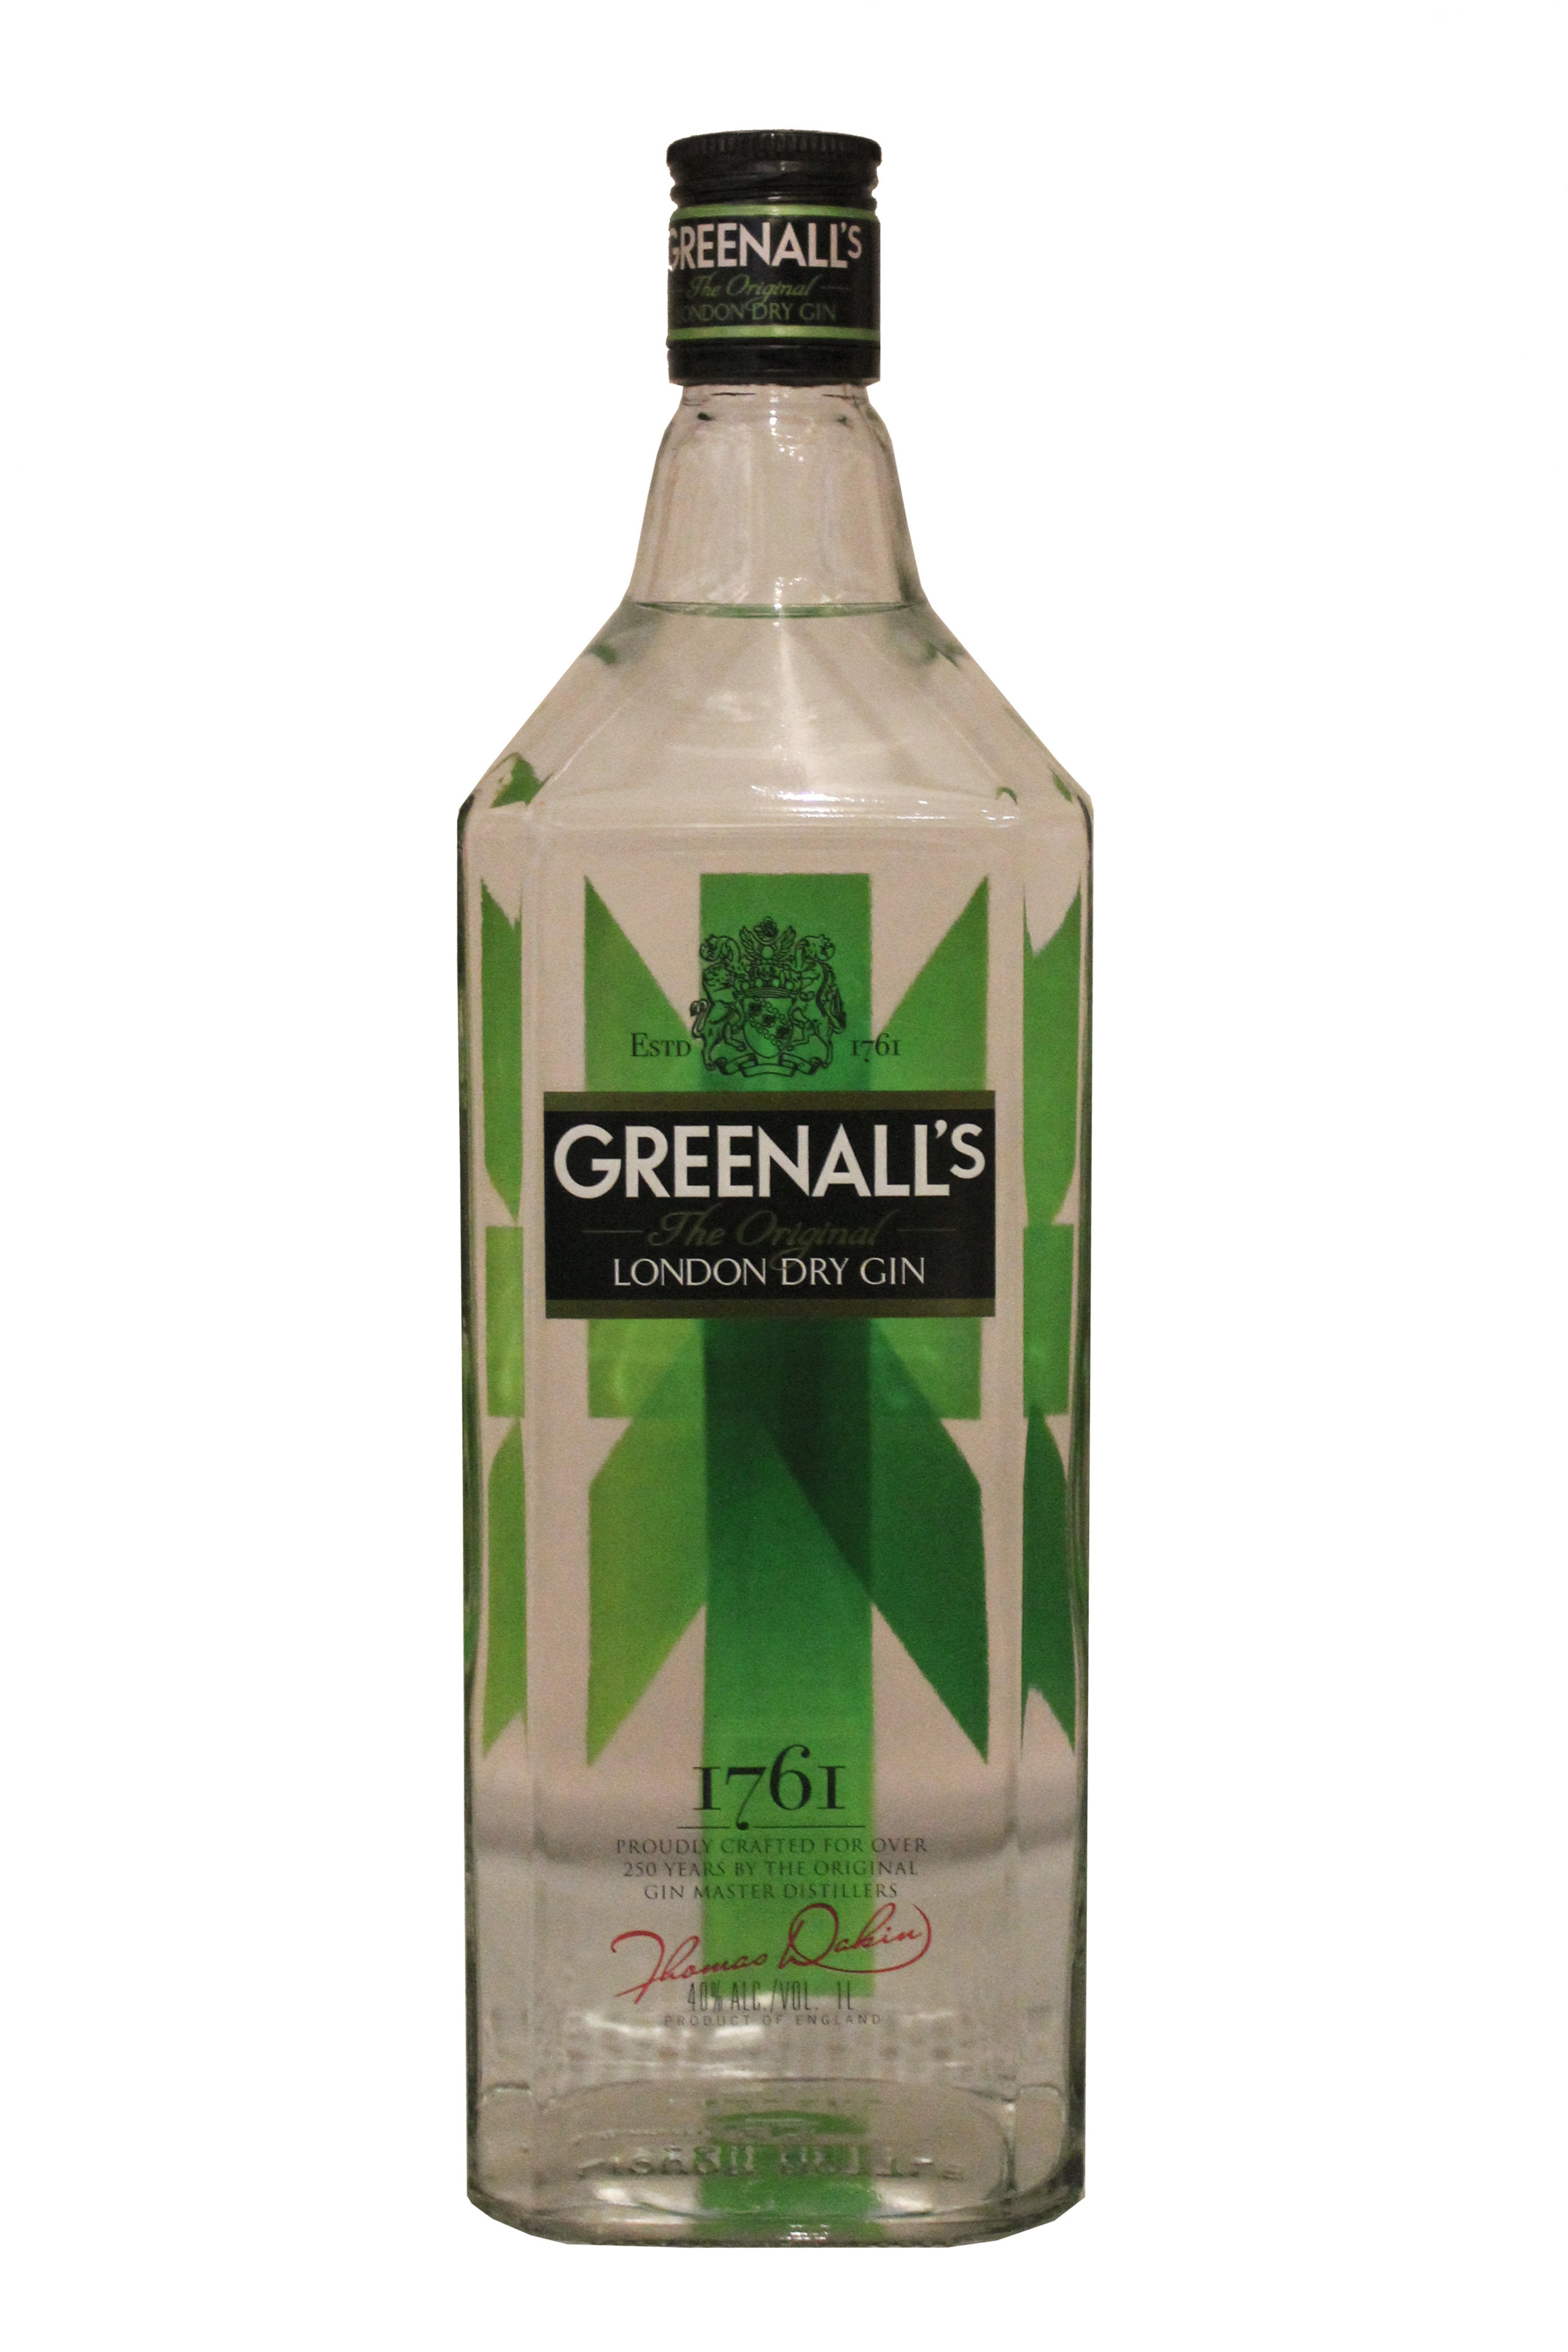 London Dry Gin  Greenall's, England